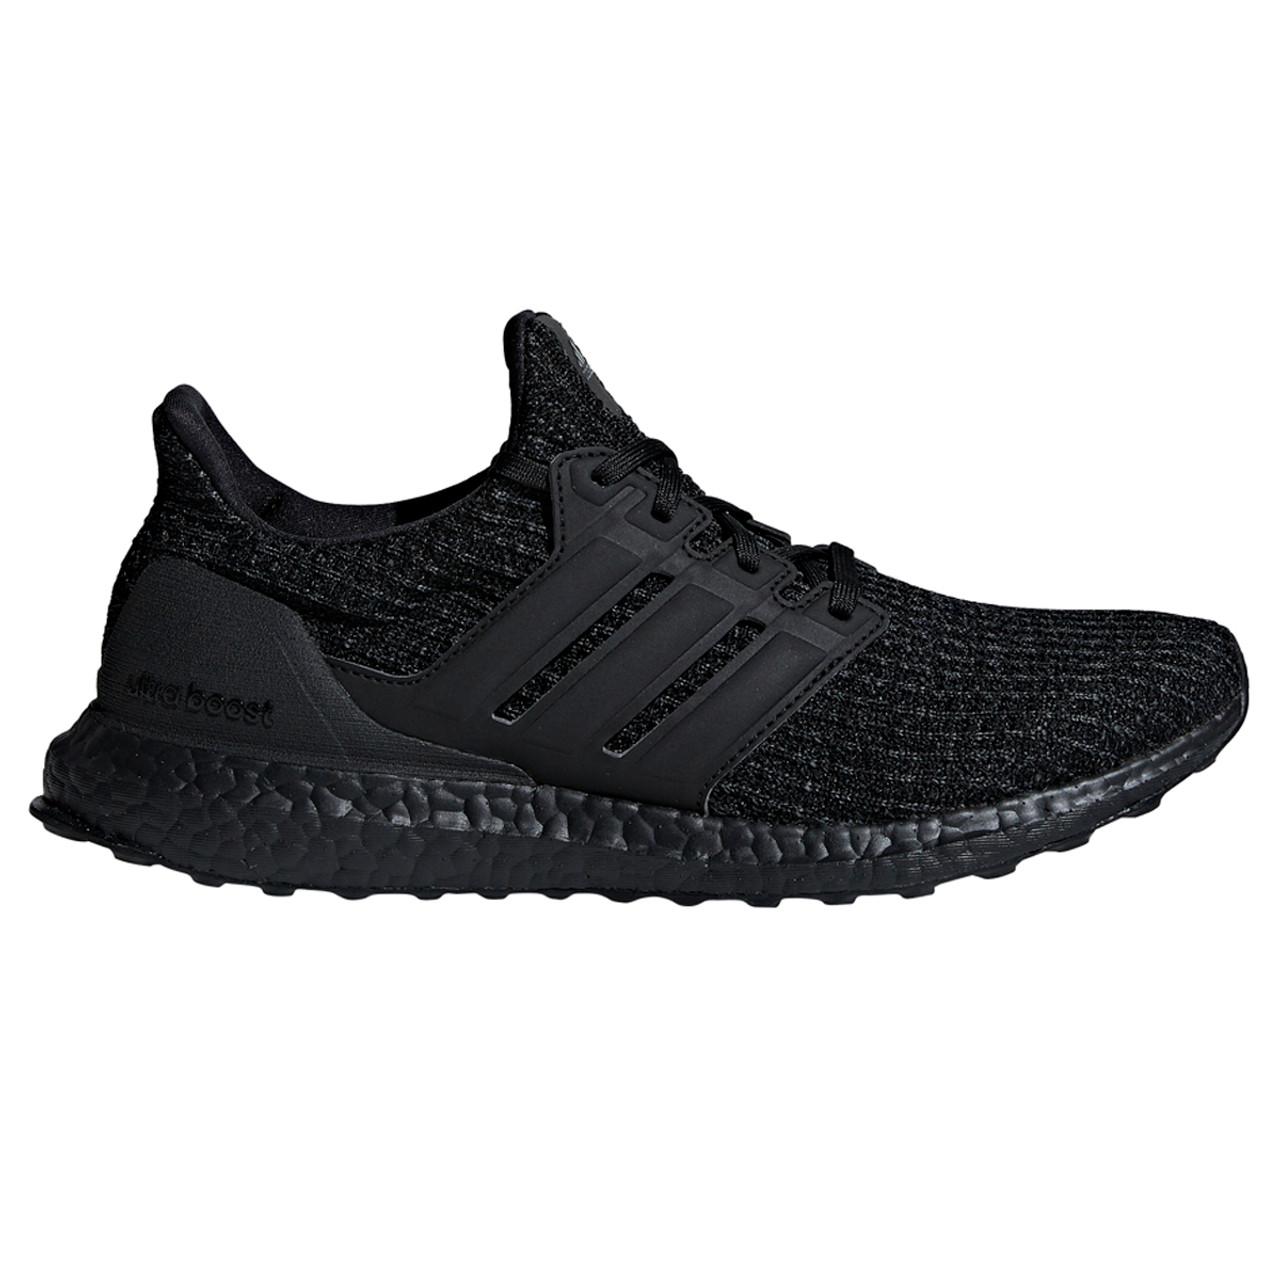 f9e5a9afa Adidas UltraBoost Men s Sneakers F36641 - Black - everysportforless.com